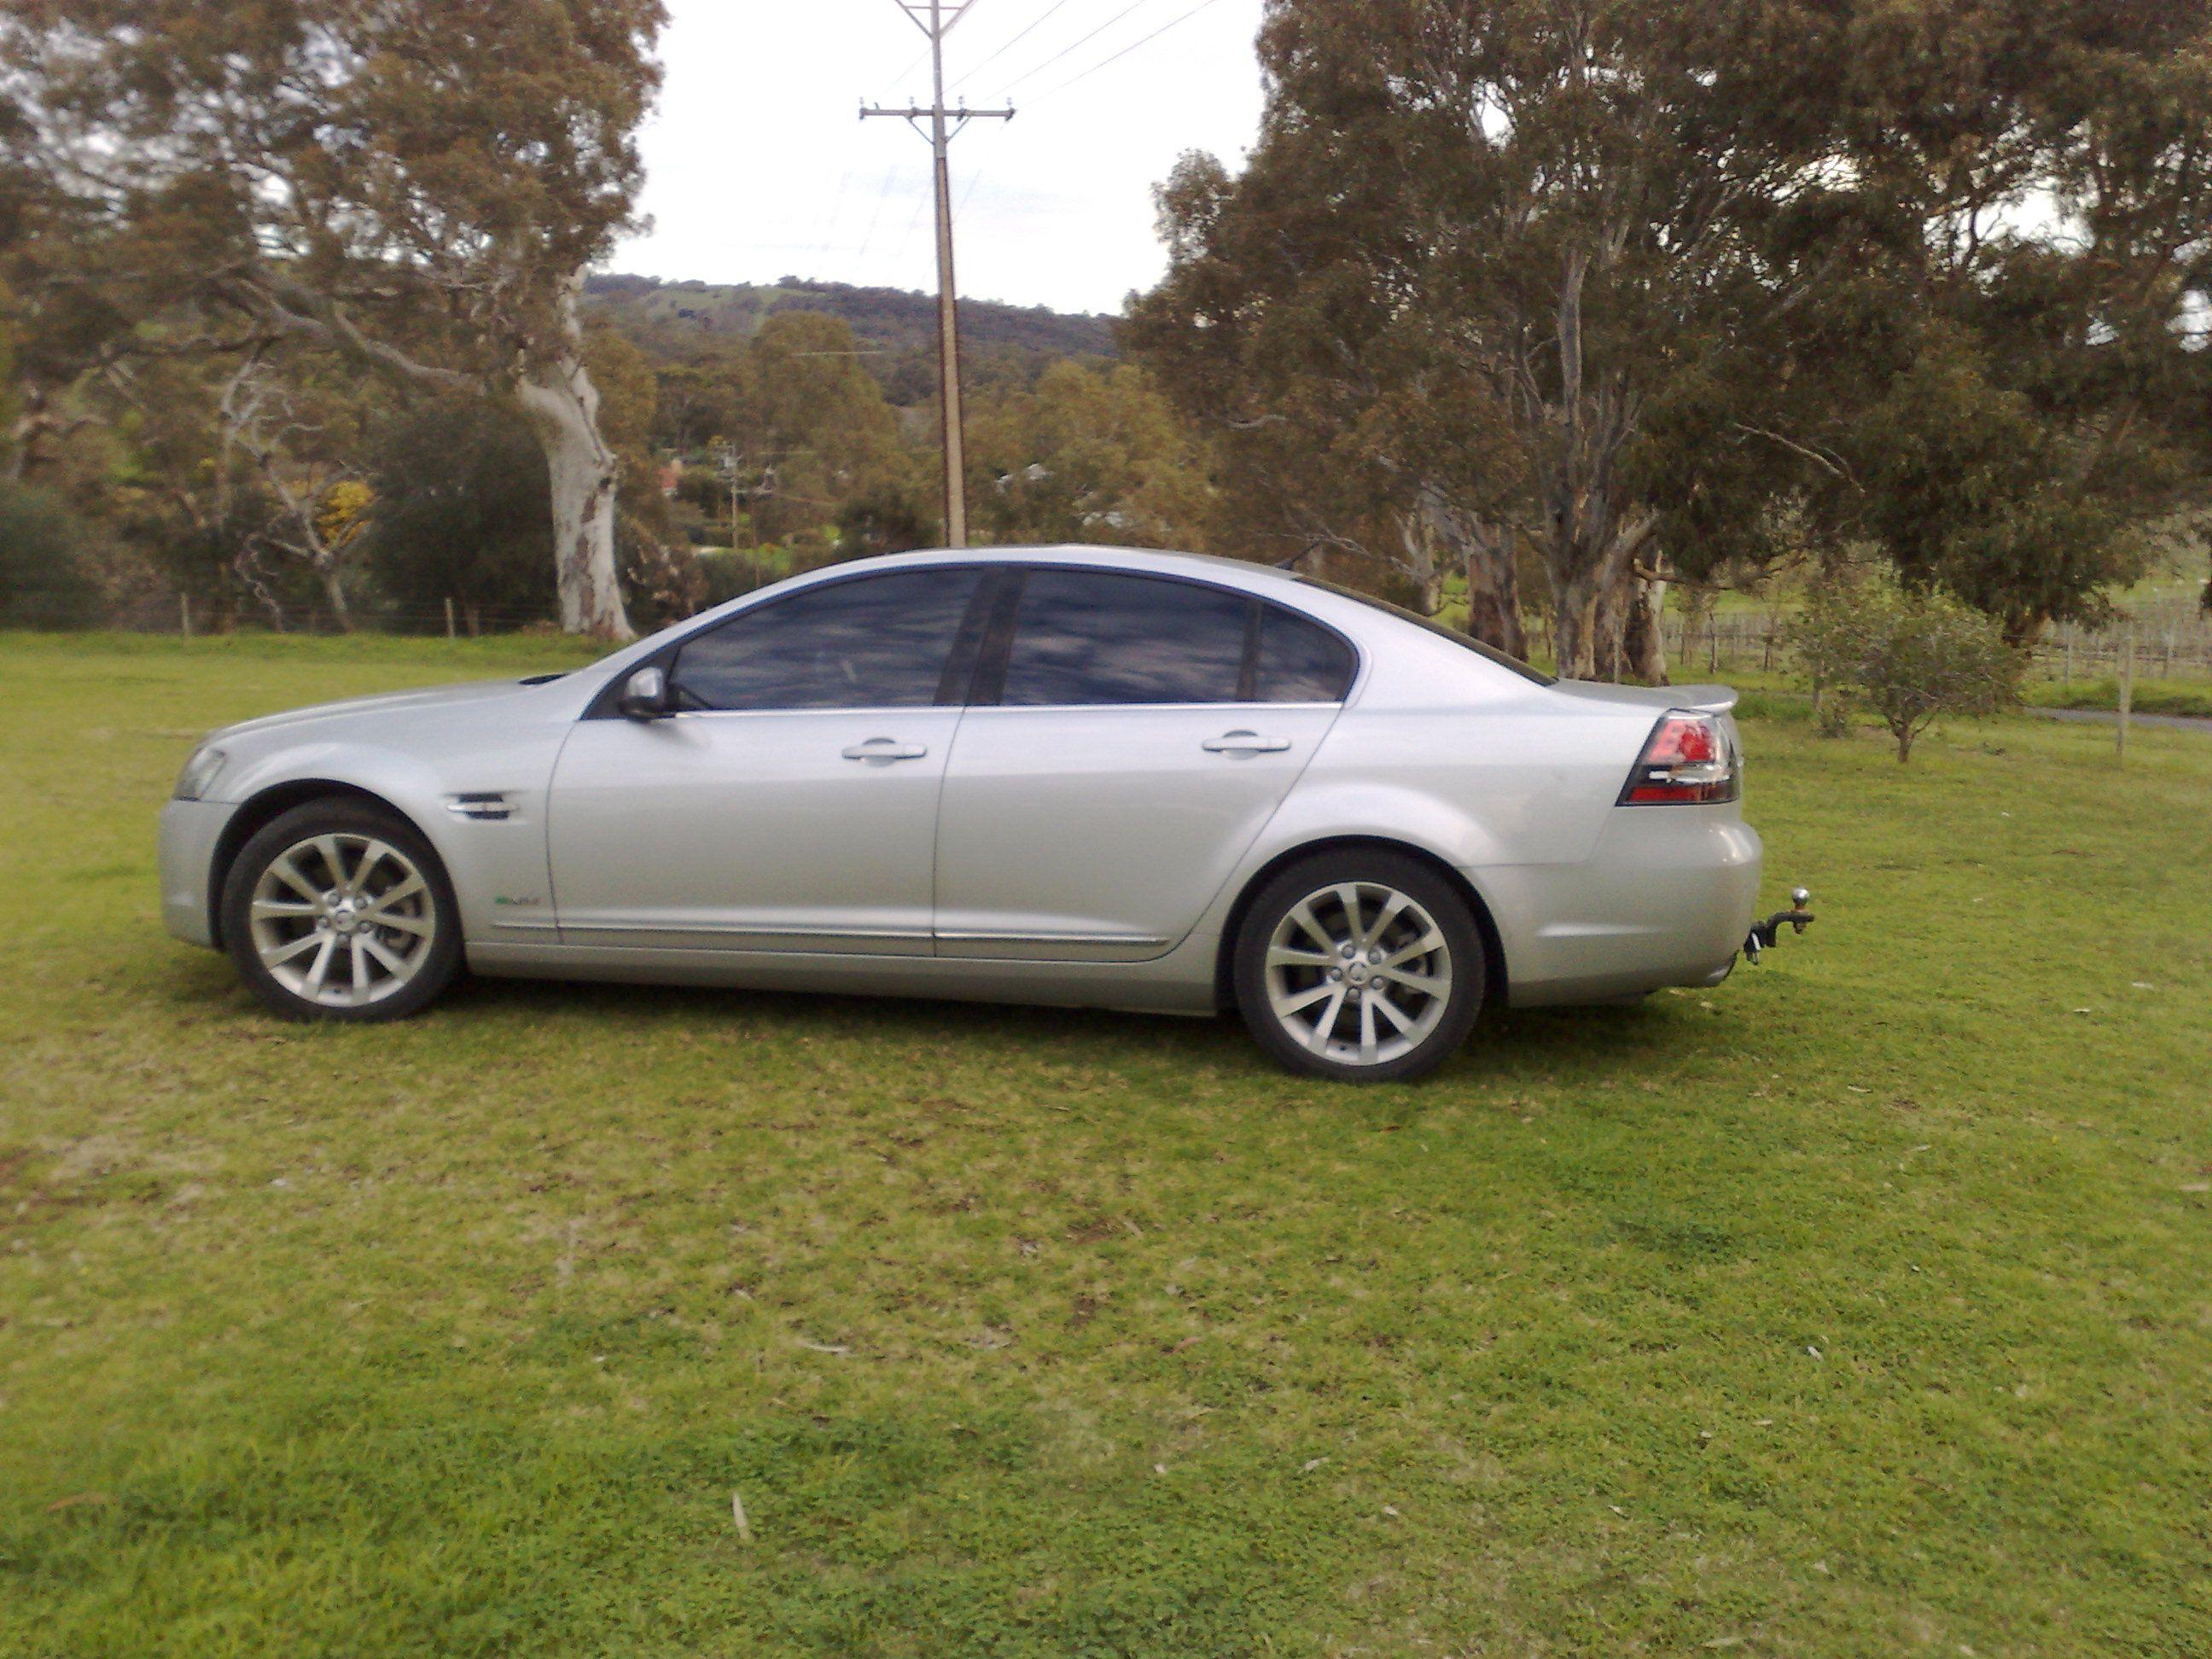 Gumtree Car Price Checker Car prices, Australian cars